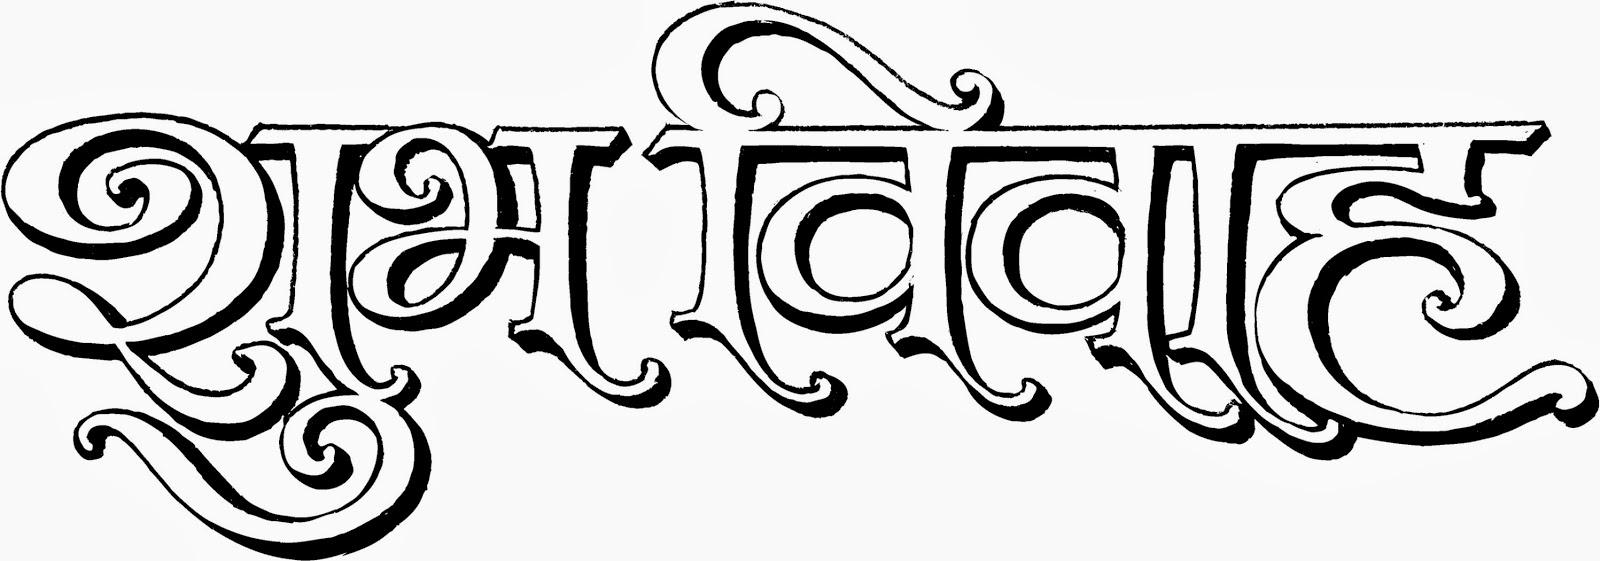 Vivah  Wikipedia